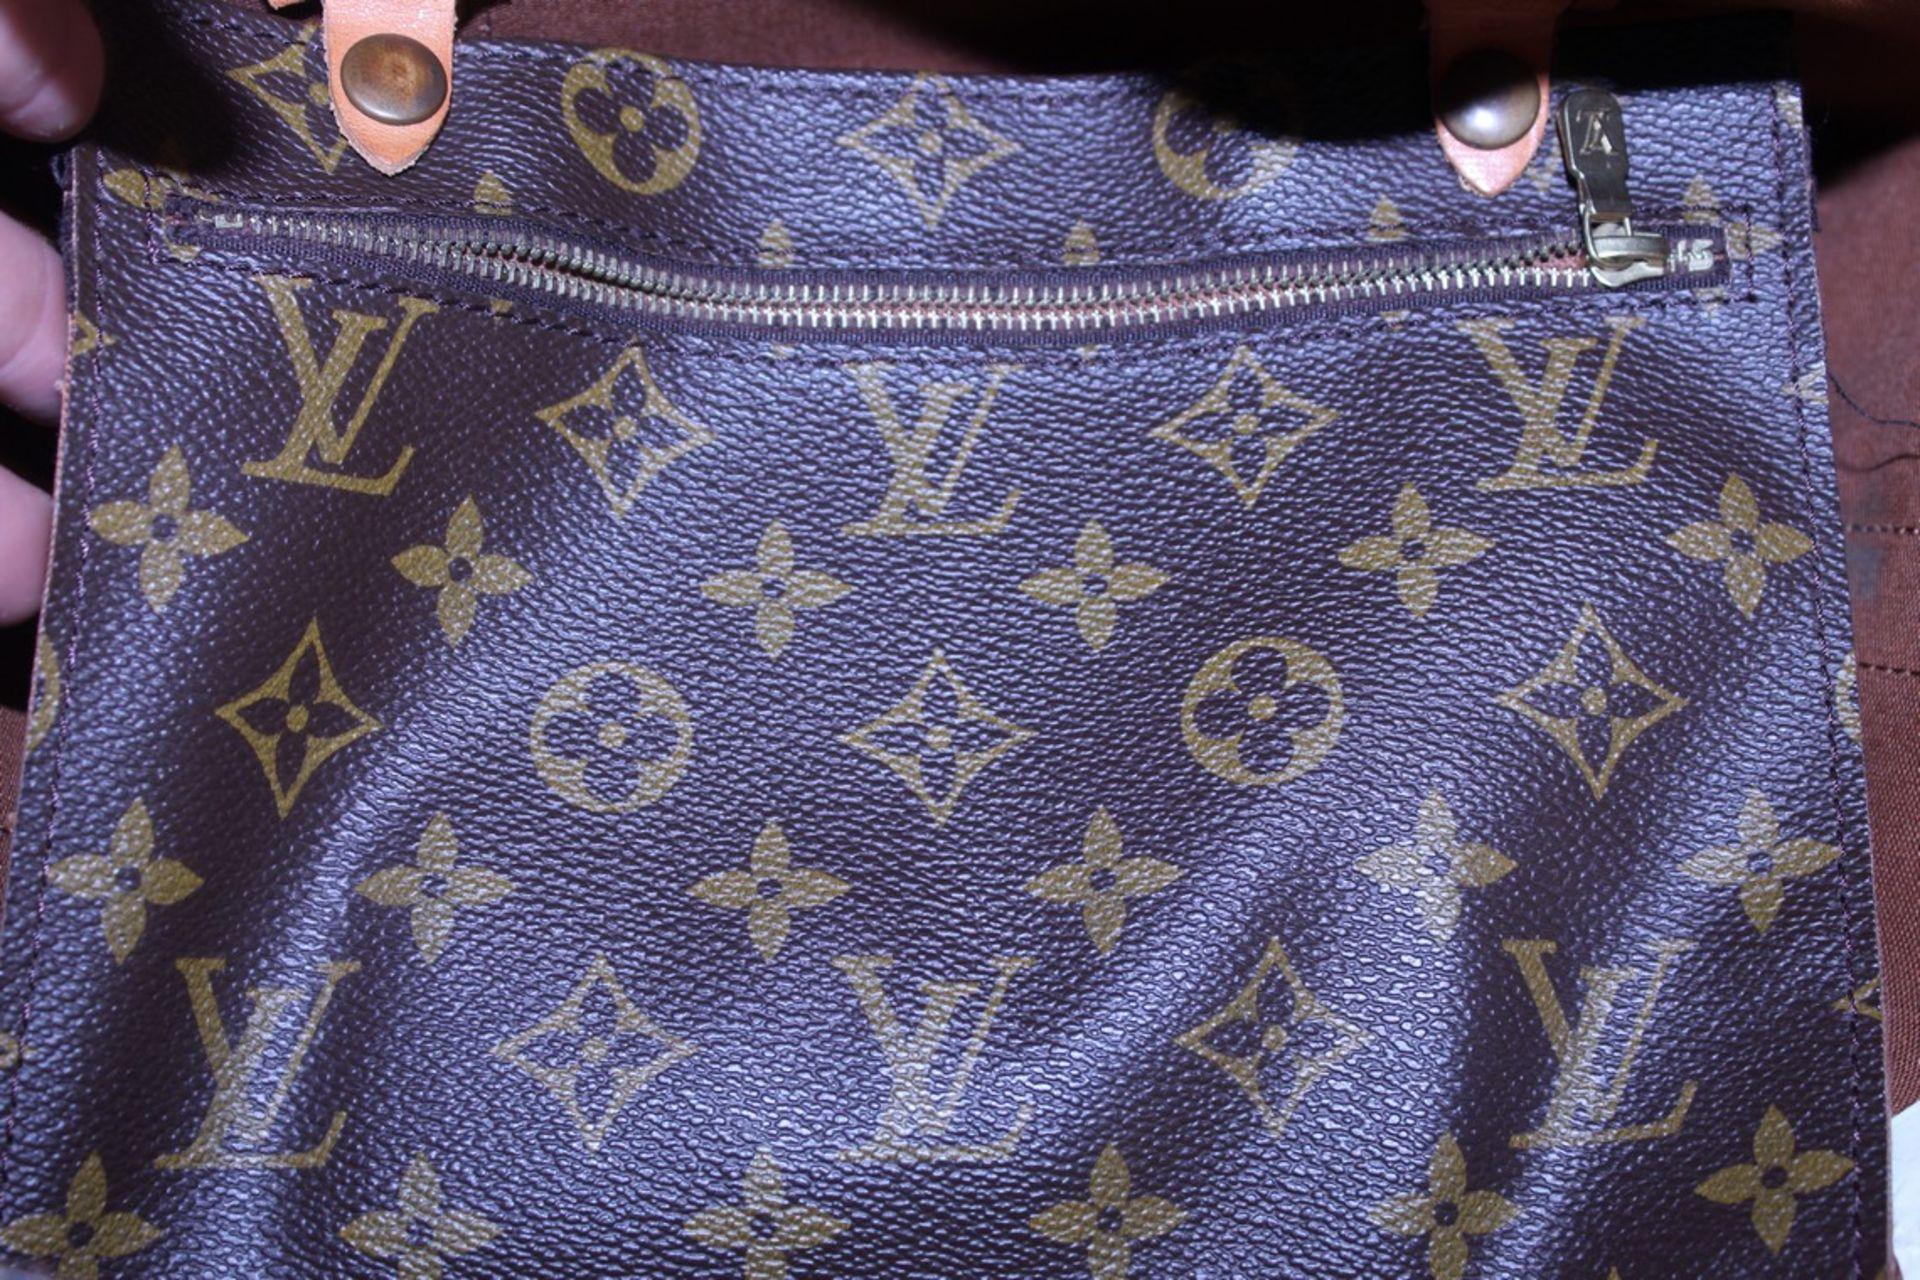 RRP £1,800 Louis Vuitton Randonnee Shoulder Bag, Brown Monogram Coated Canvas, Vachetta Handles, ( - Image 3 of 4